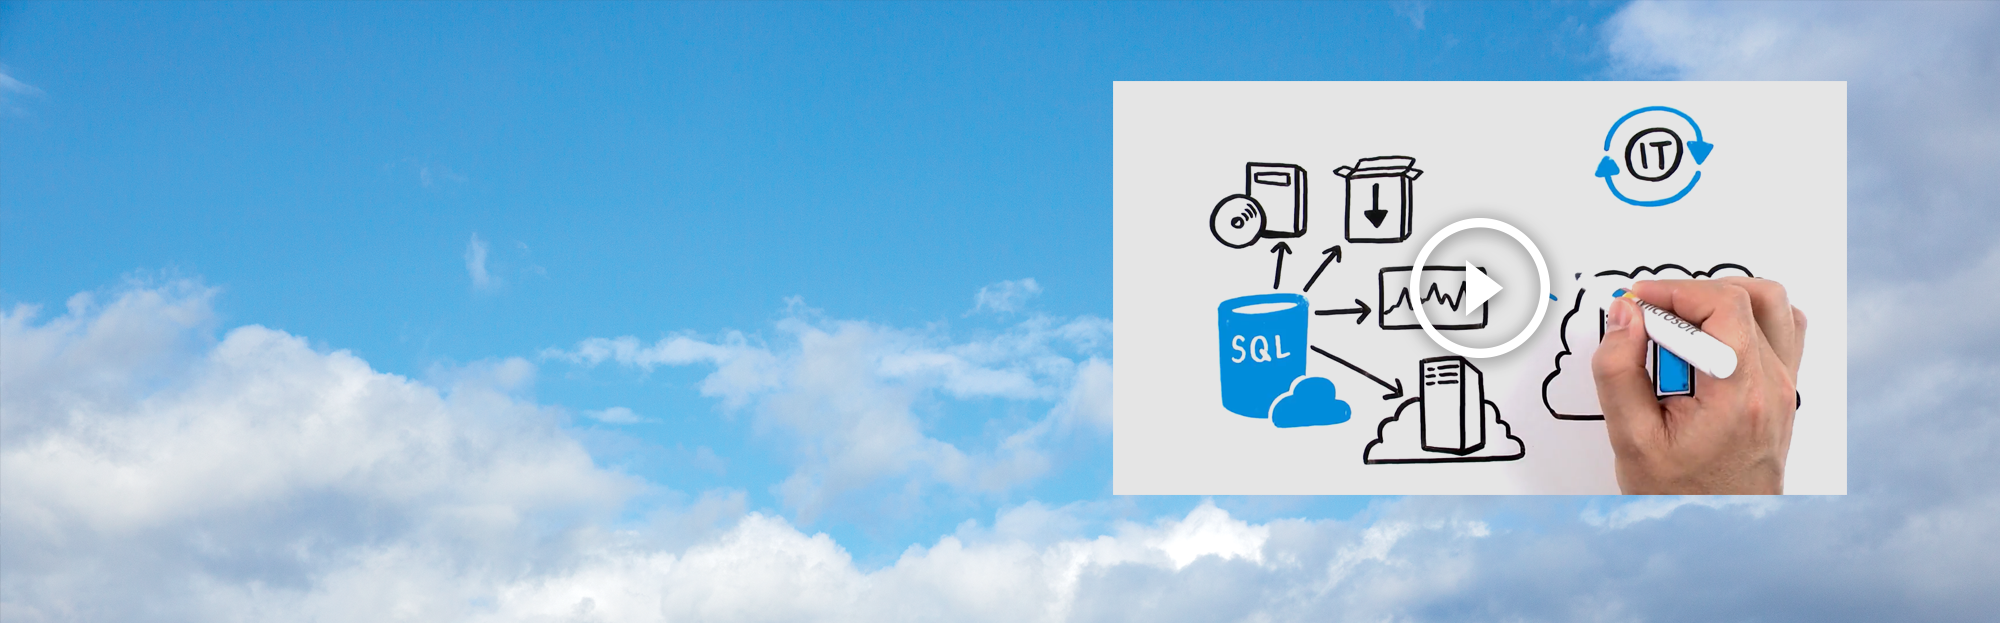 Software Asset Management Microsoft Sam